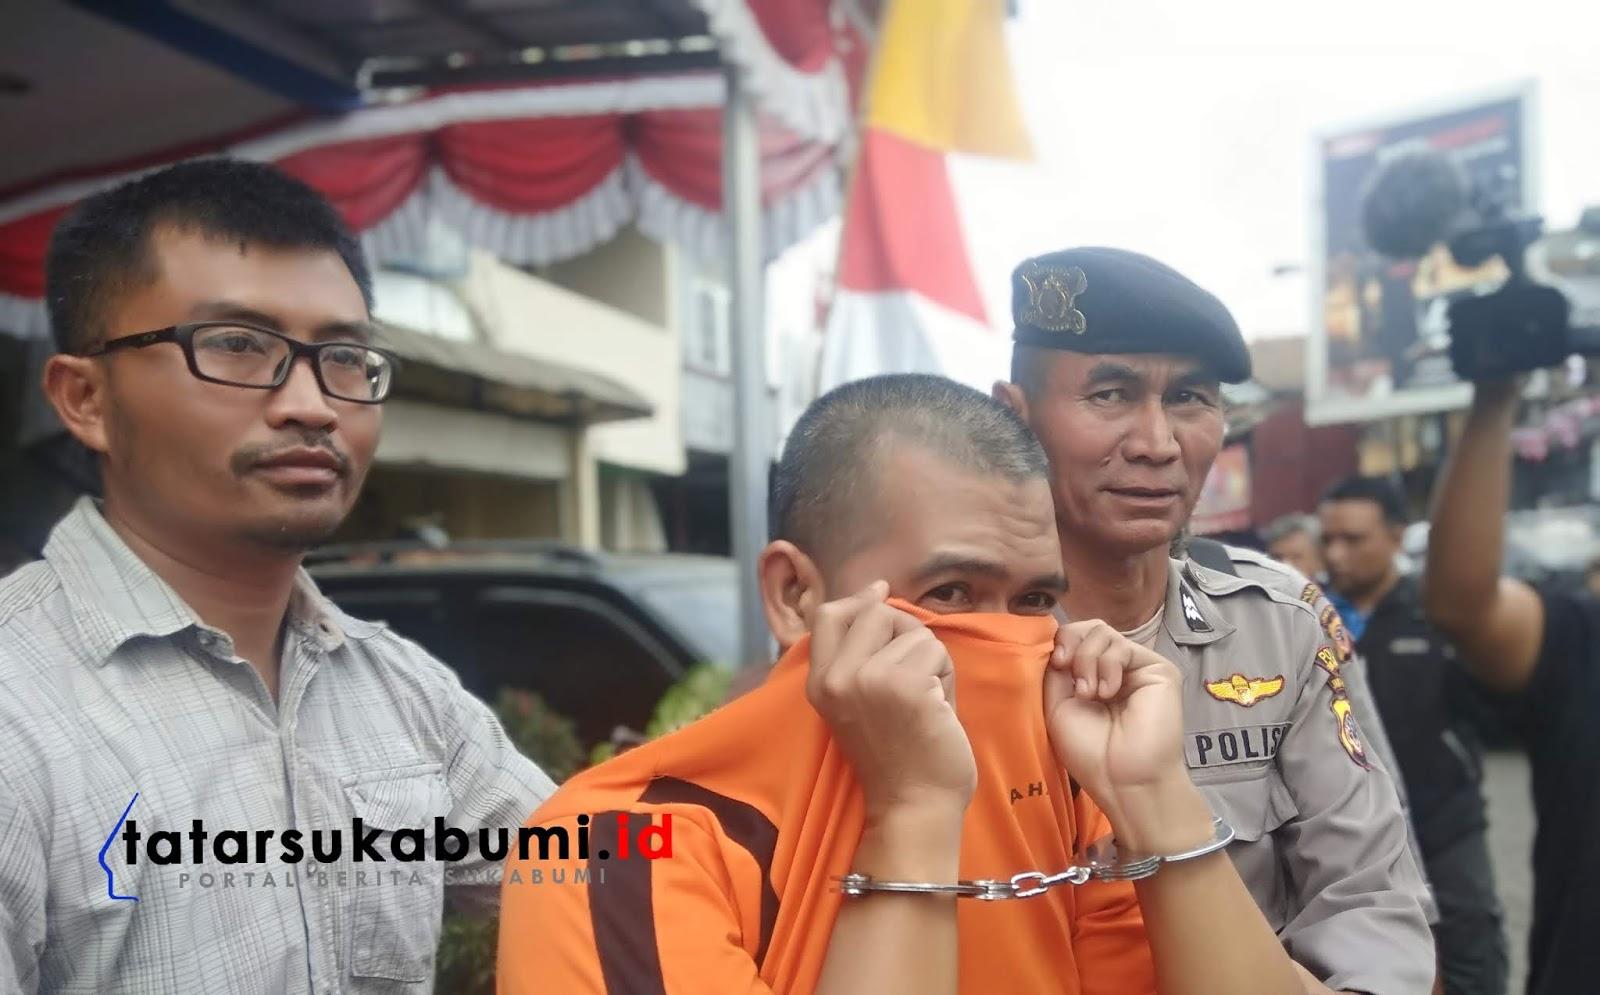 Akibat Kecanduan Judi Online Warga Baros Sukabumi Tipu dan Jual Mobil Calon Nasabah Bank